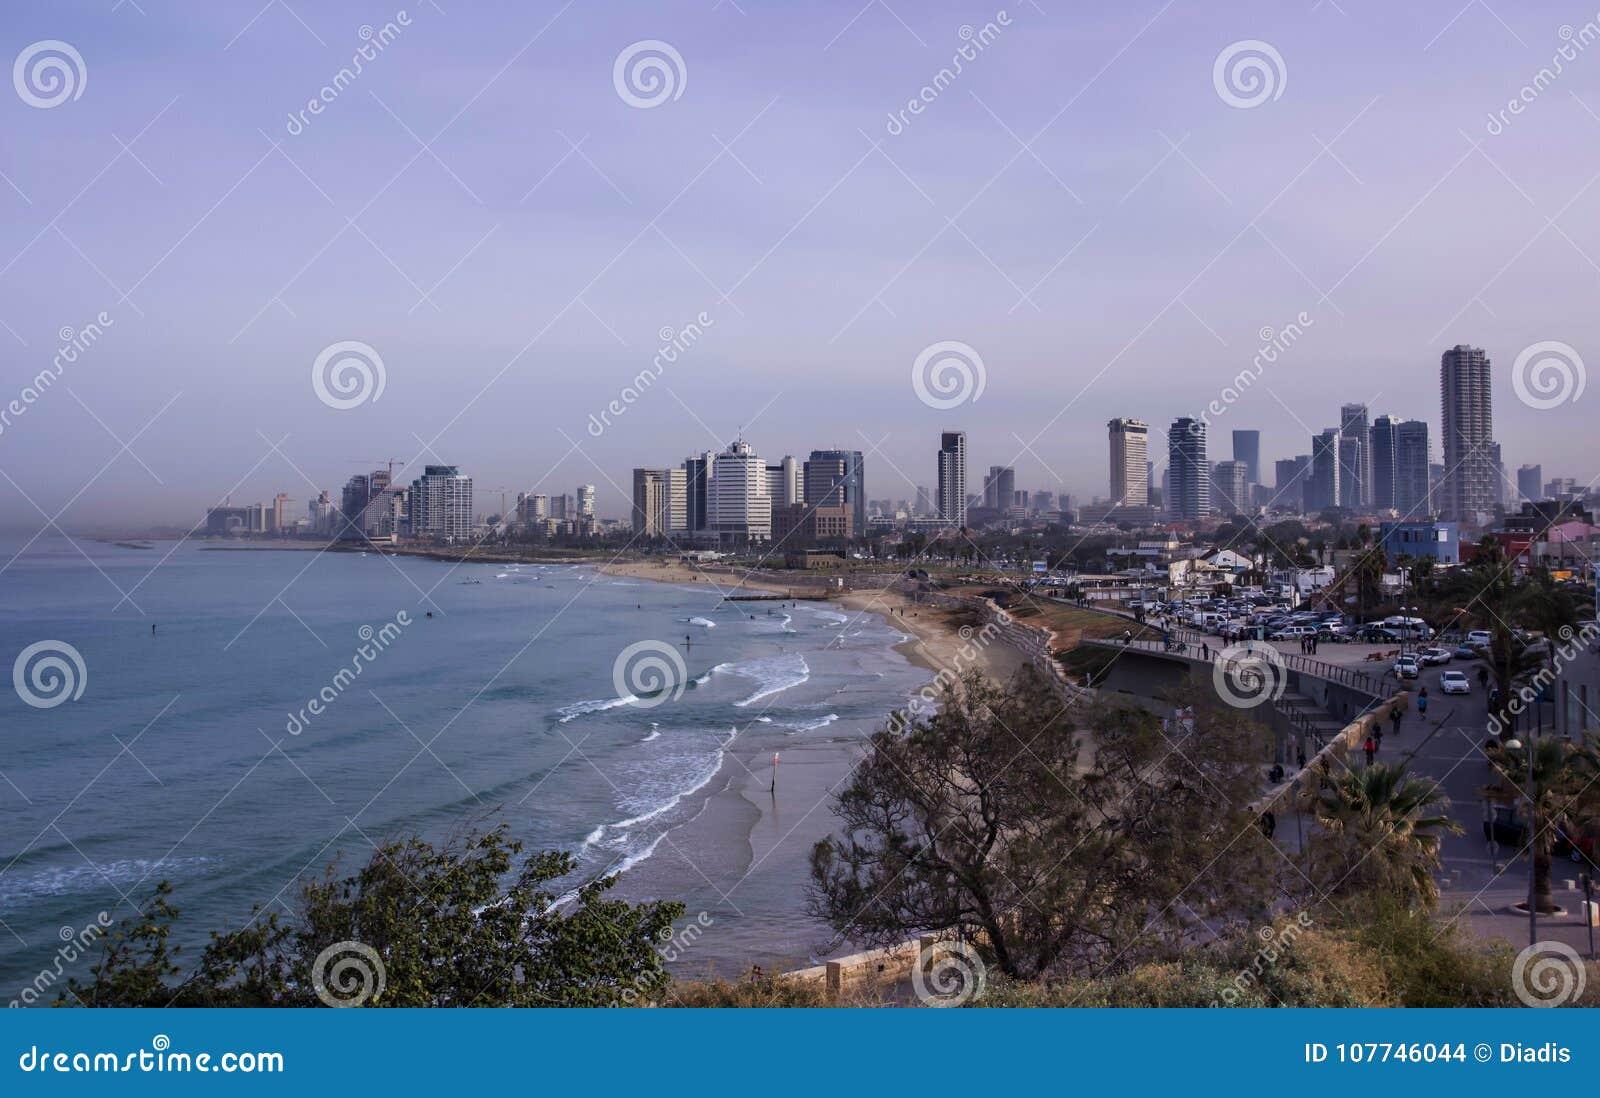 Tel Aviv beach and city Skyline in the morning mist Israel